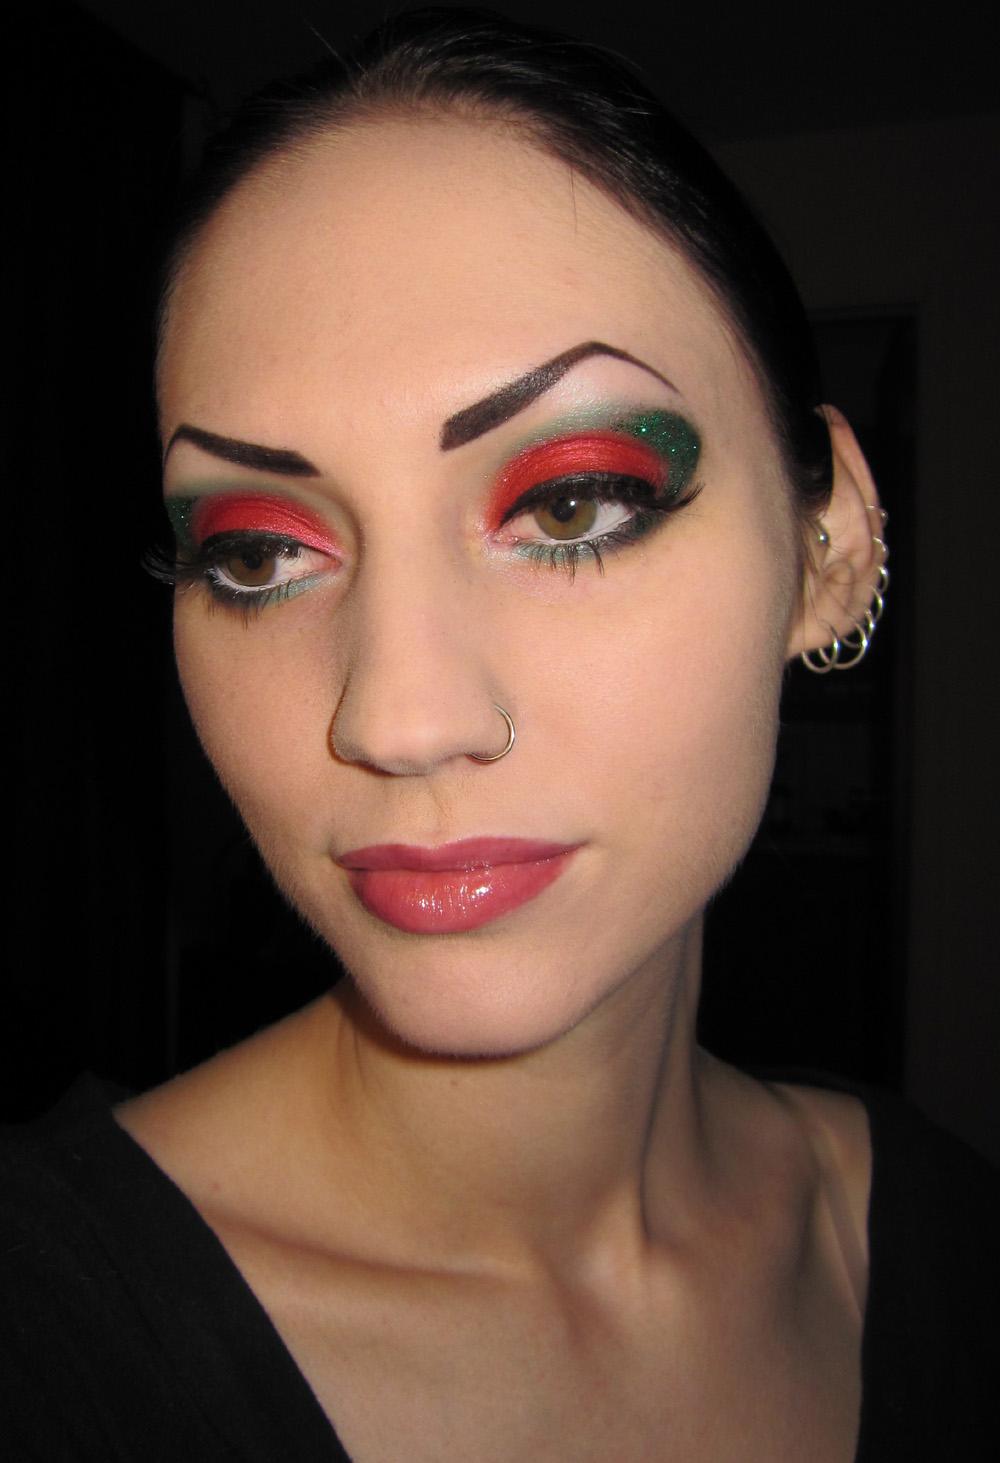 elf mineral eyeshadow primer applied to upper lid blending in gently with ring finger - Christmas Elf Makeup